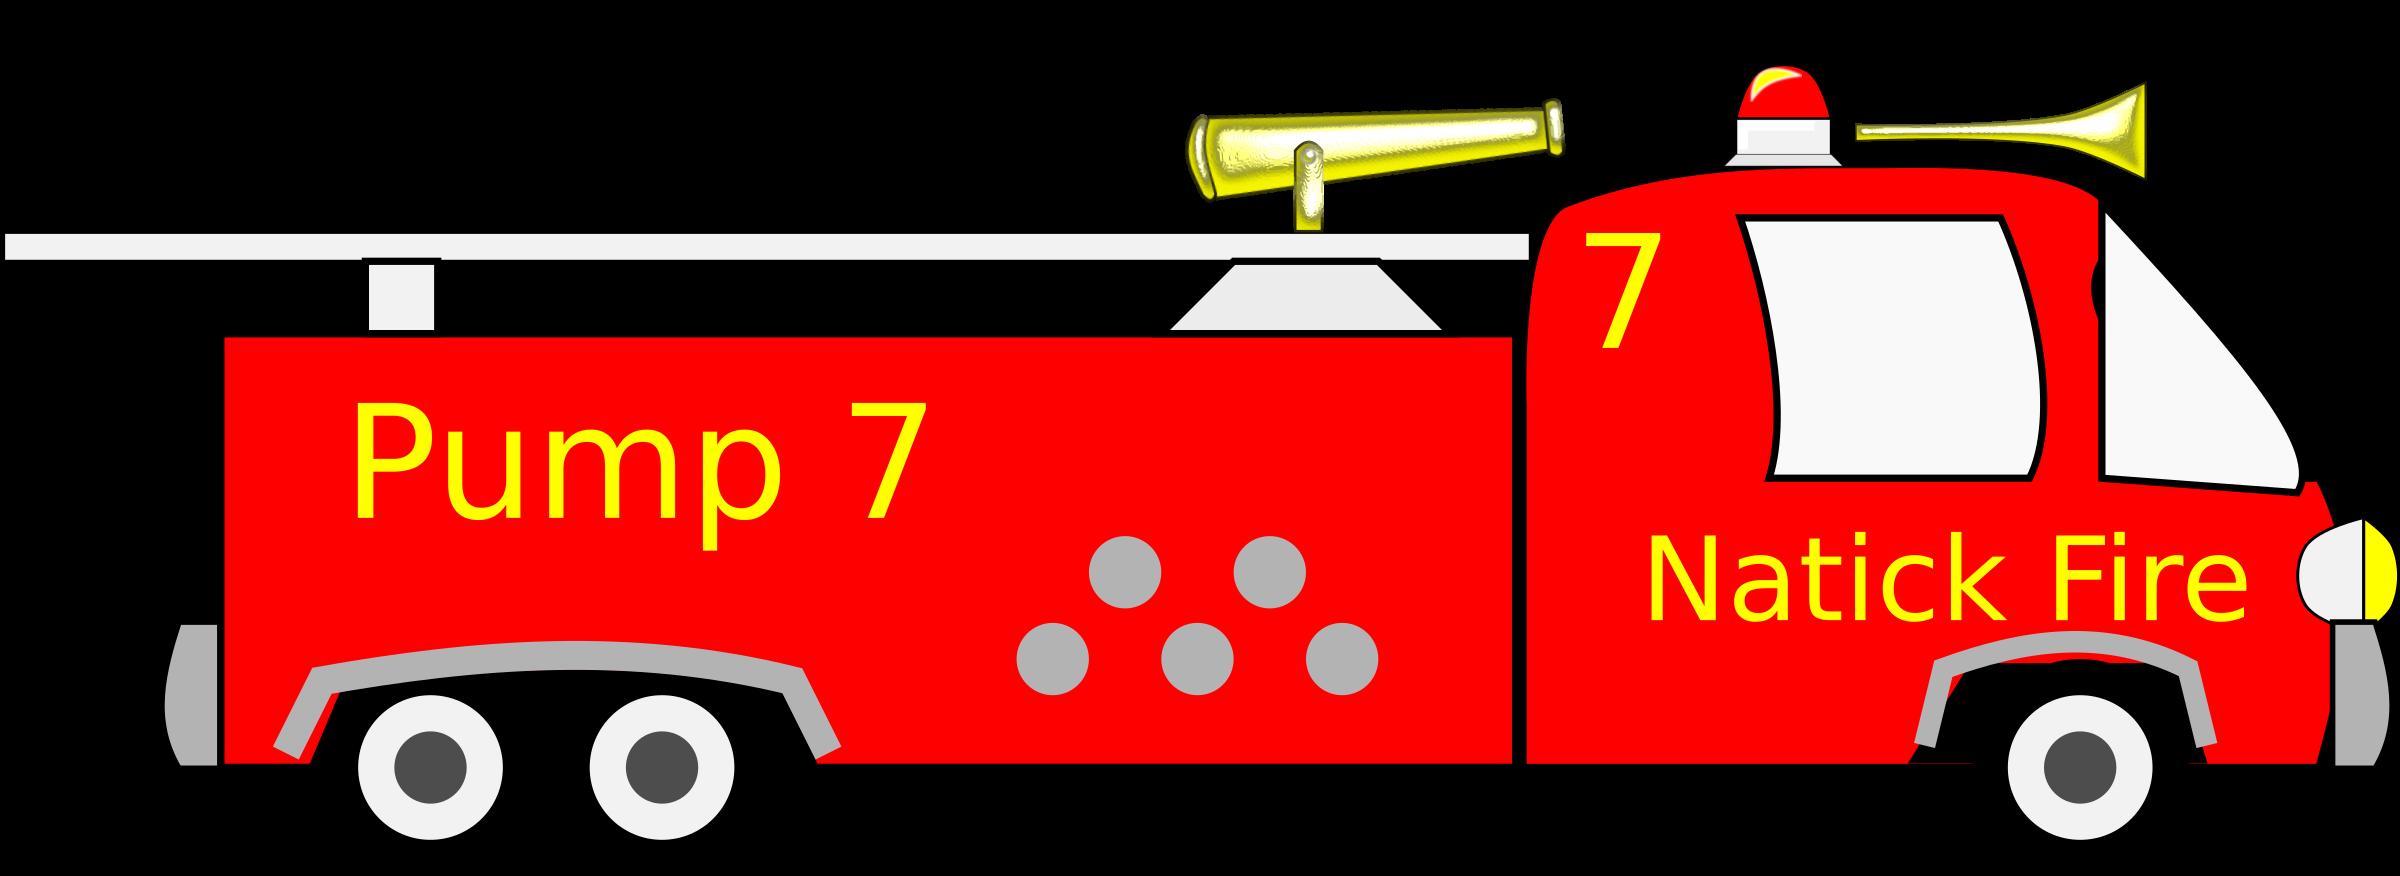 Firetruck clipart toy. Fire truck big image